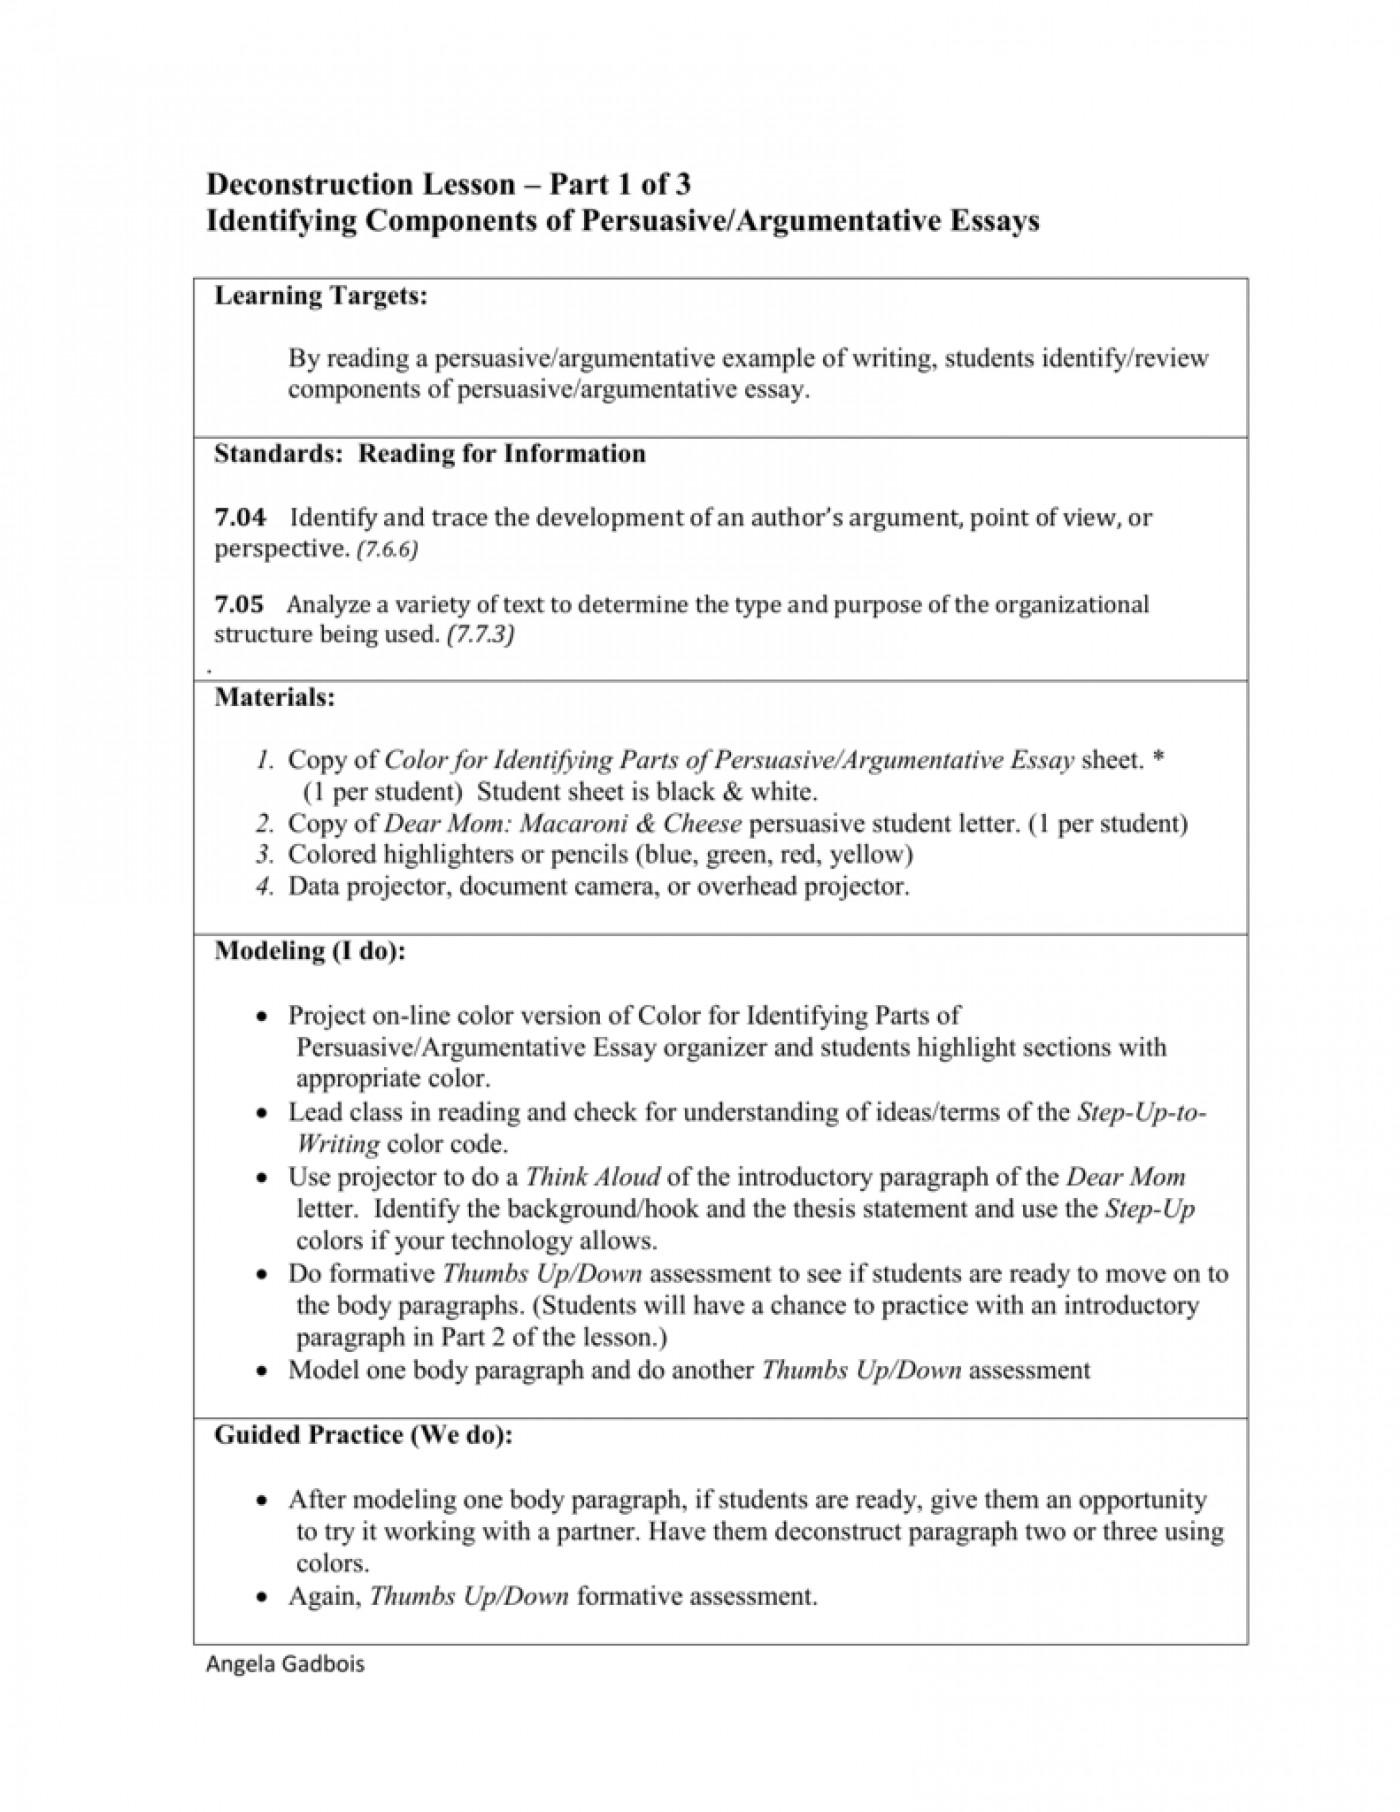 008 Essay Example 008053854 1 Parts Of Imposing 6 A Persuasive 1400